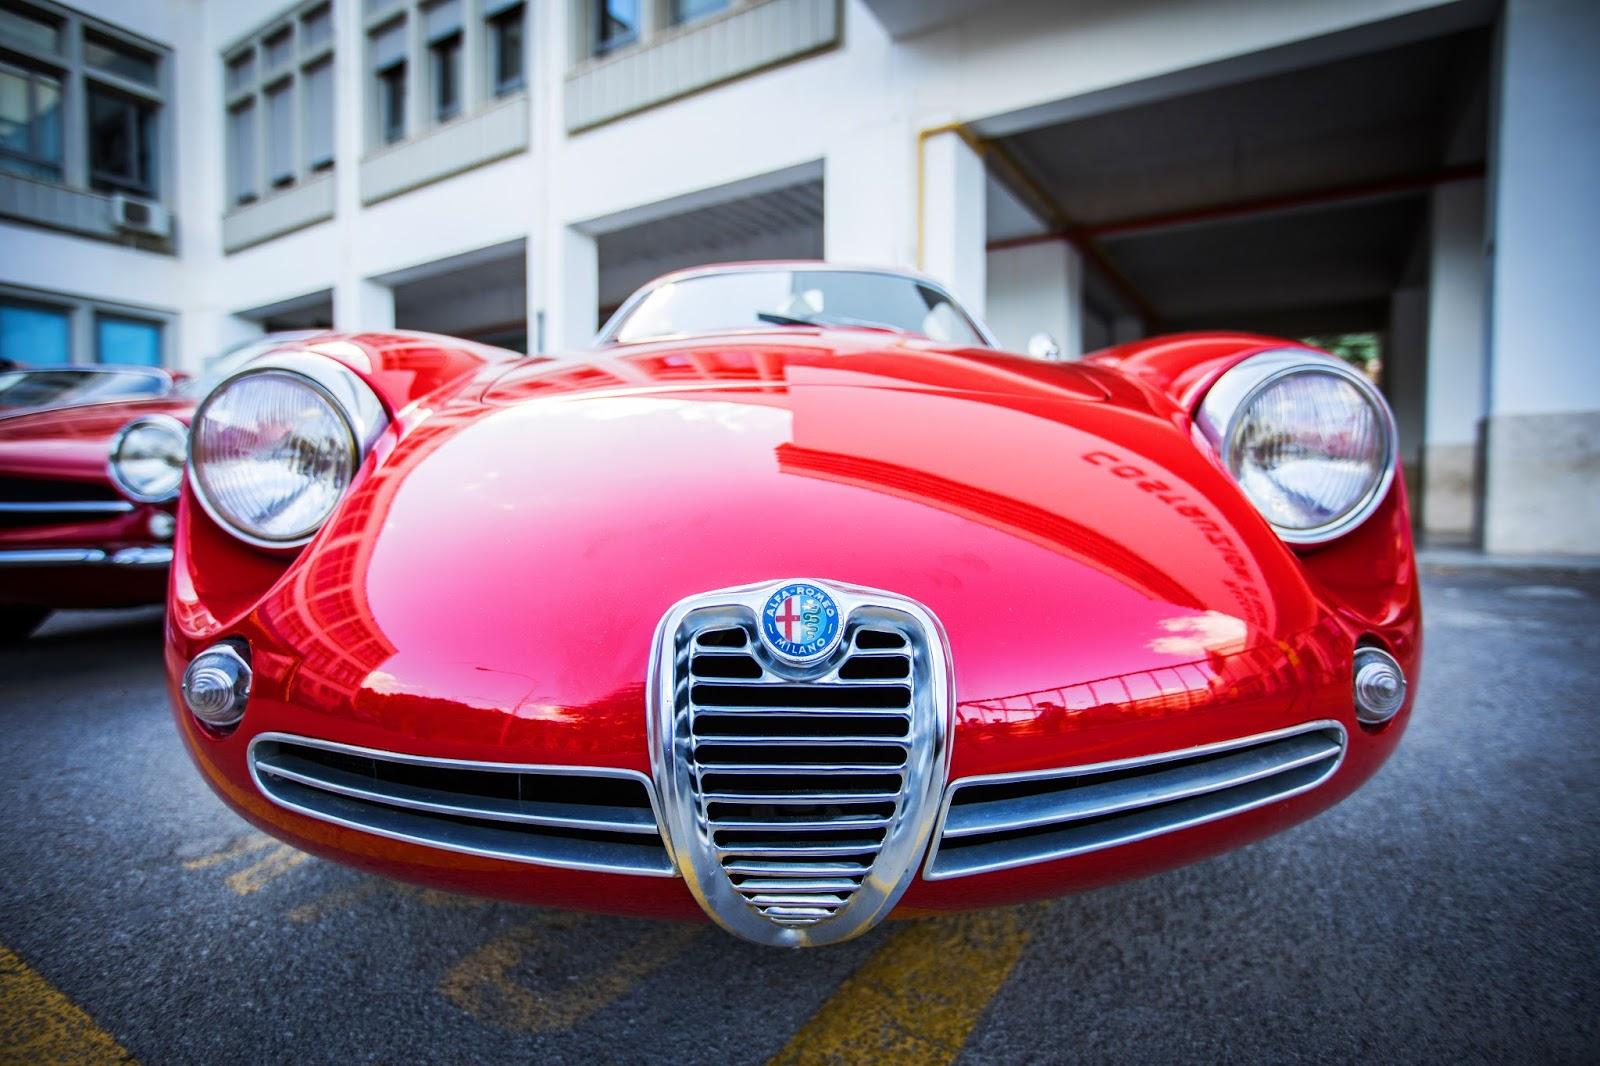 170420 Alfa Romeo On Air 03 H 1960 Giulietta SZ στο 101ο Targa Florio Alfa, alfa romeo, Alfa Romeo Giulietta, Alfa Romeo Giulietta SZ, Classic, Targa Florio, videos, αγωνες